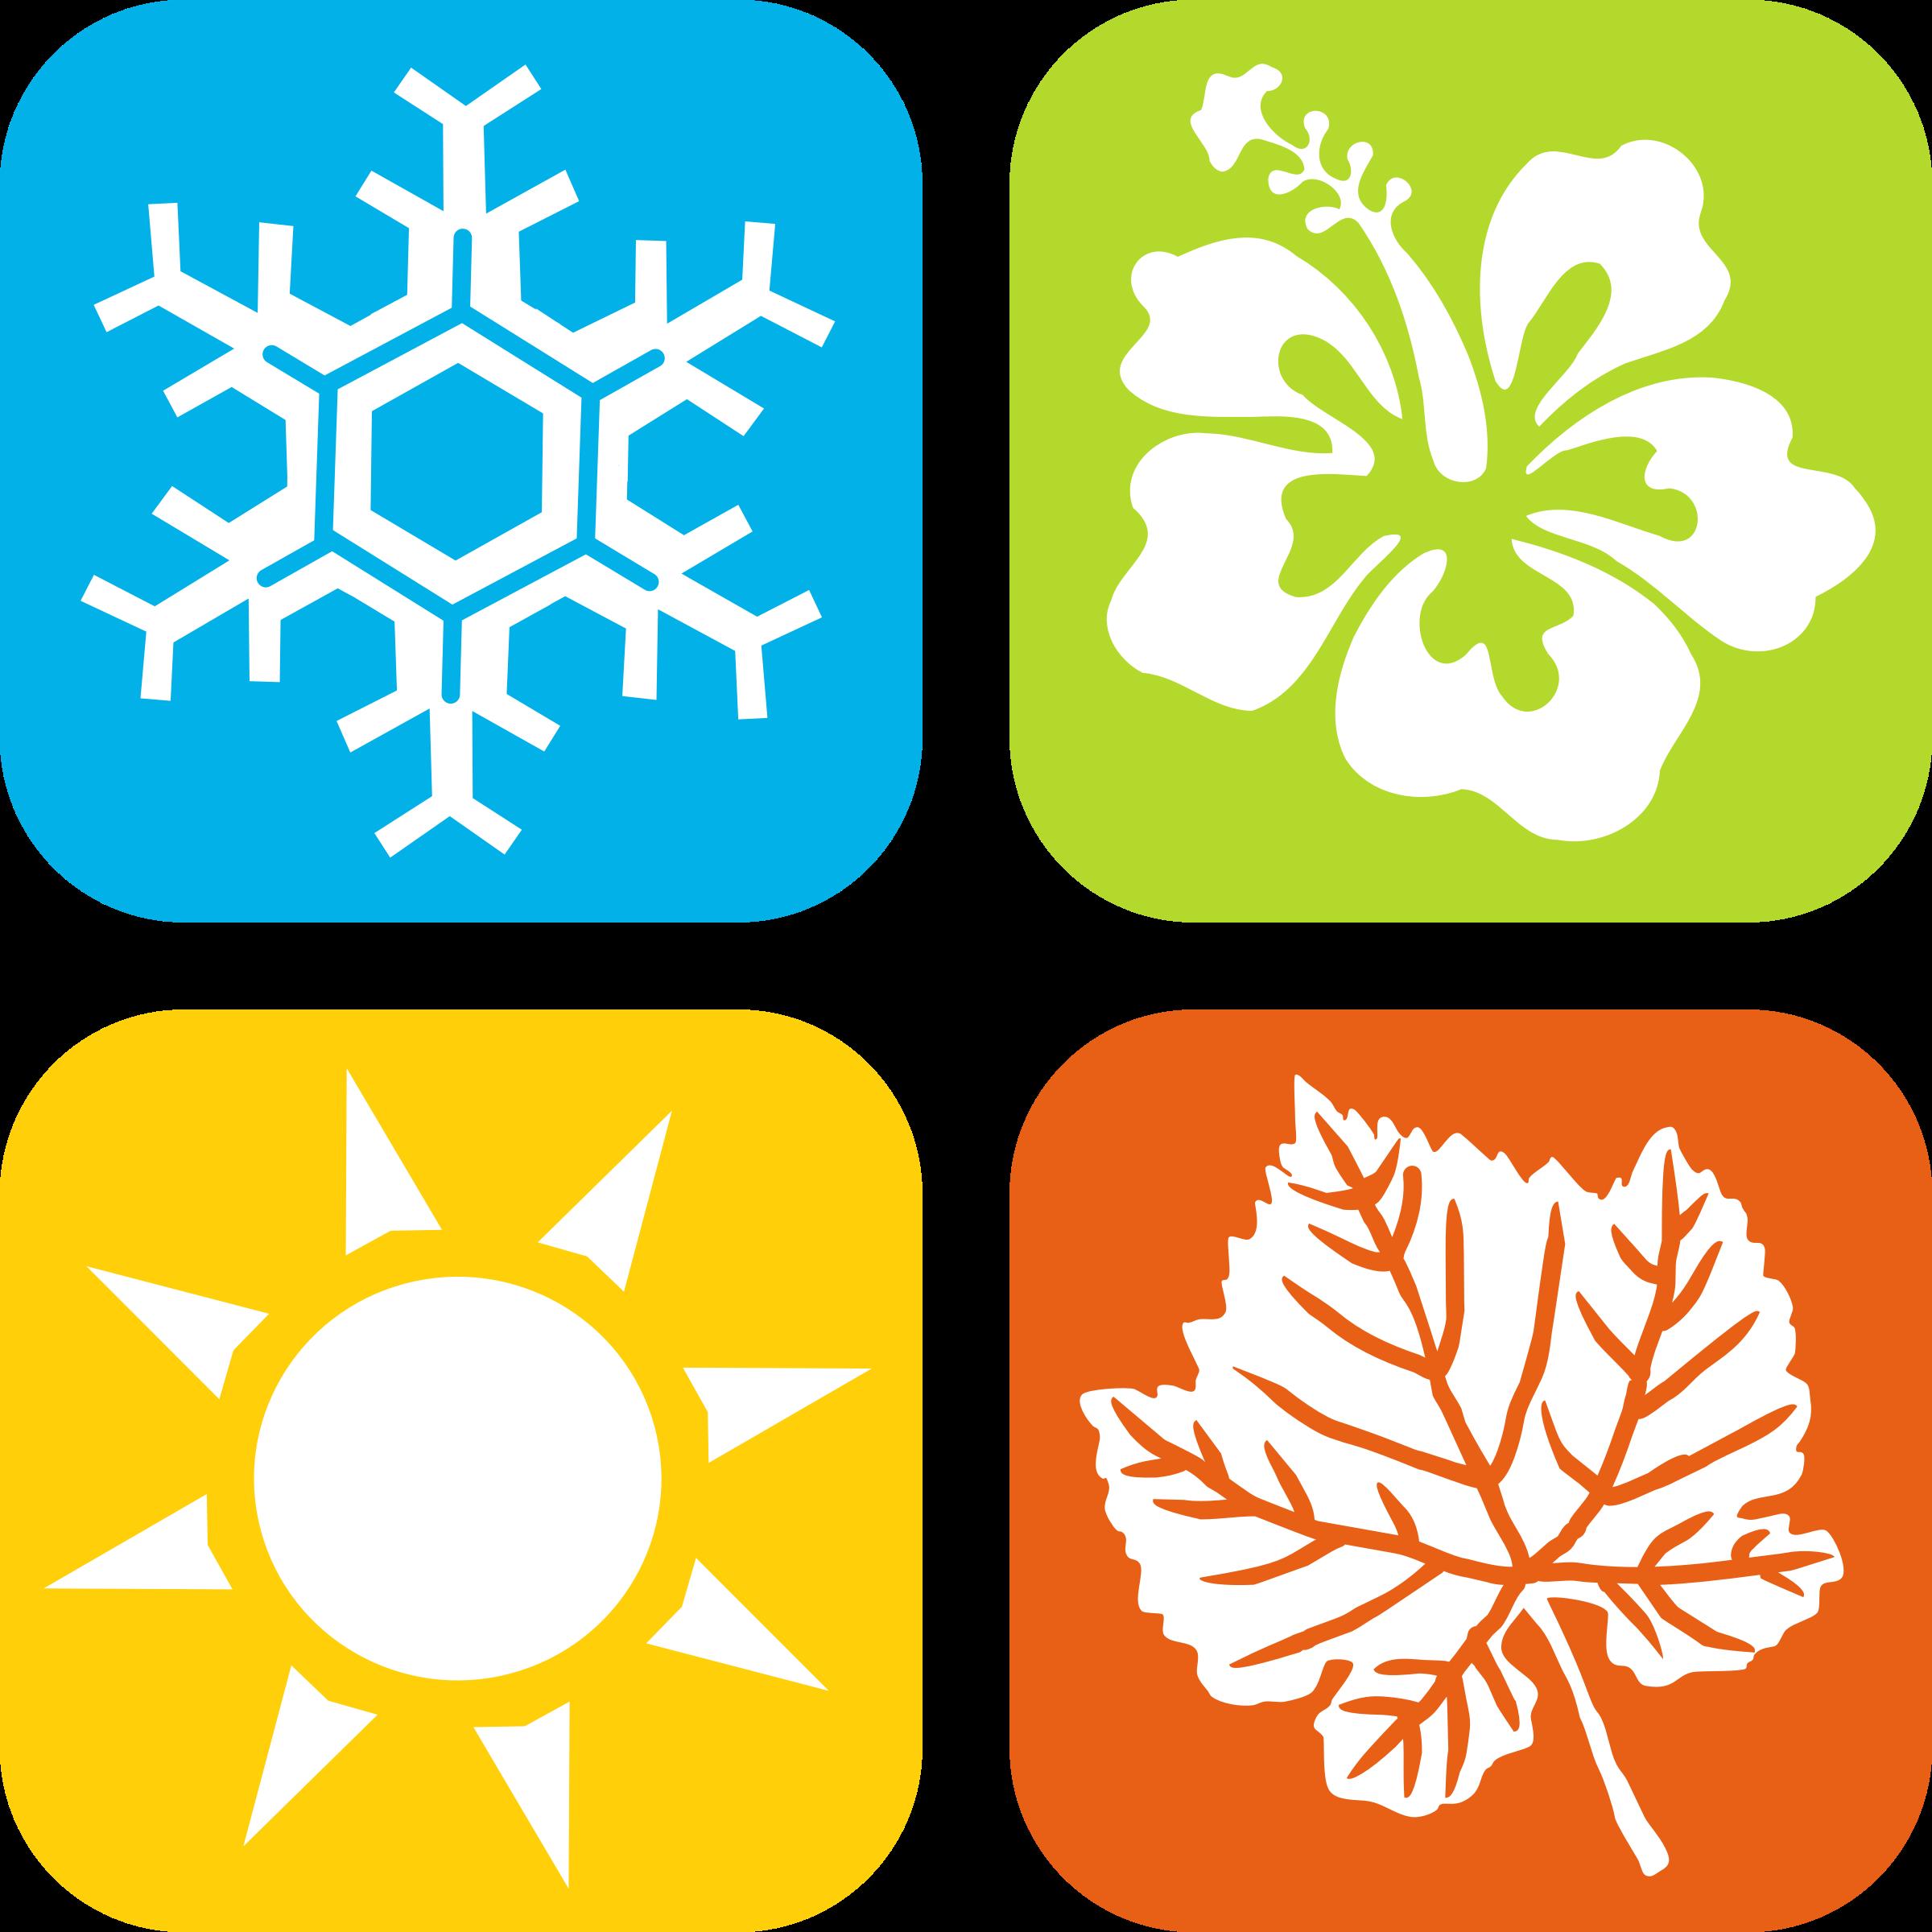 4 seasons clipart free download best 4 seasons clipart on 600x449 season clipart spring rain 2400x2400 seasons icons by gdj icons icons biocorpaavc